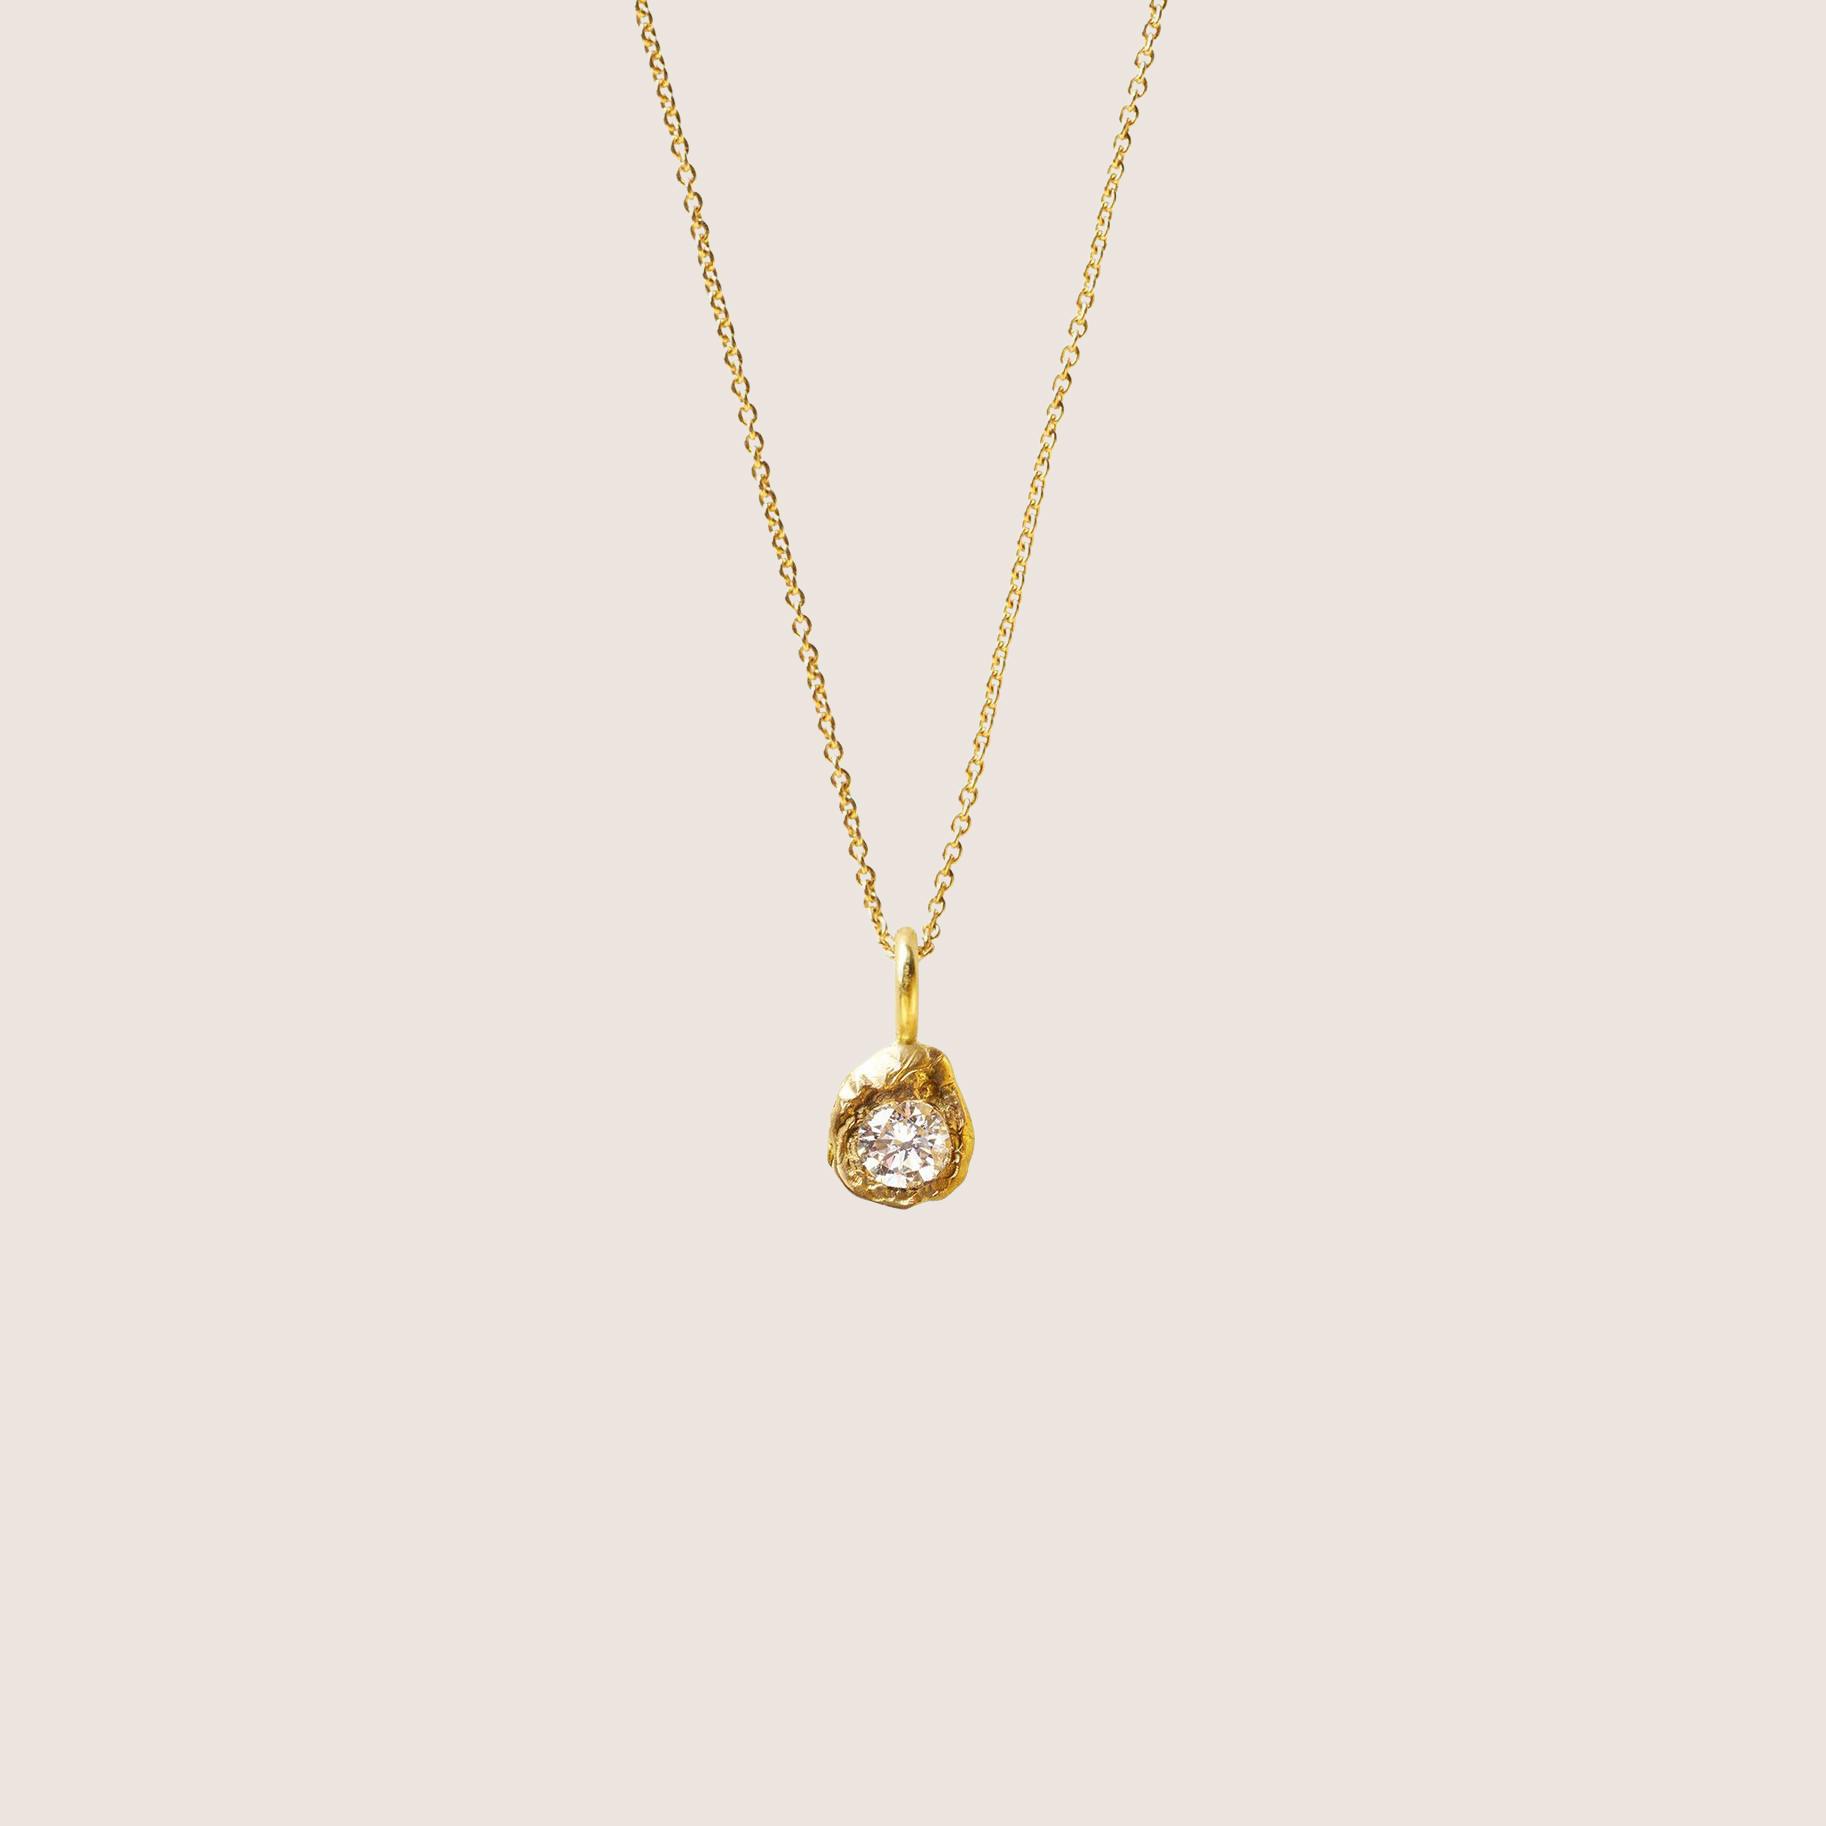 Iman 0.20ct Necklace